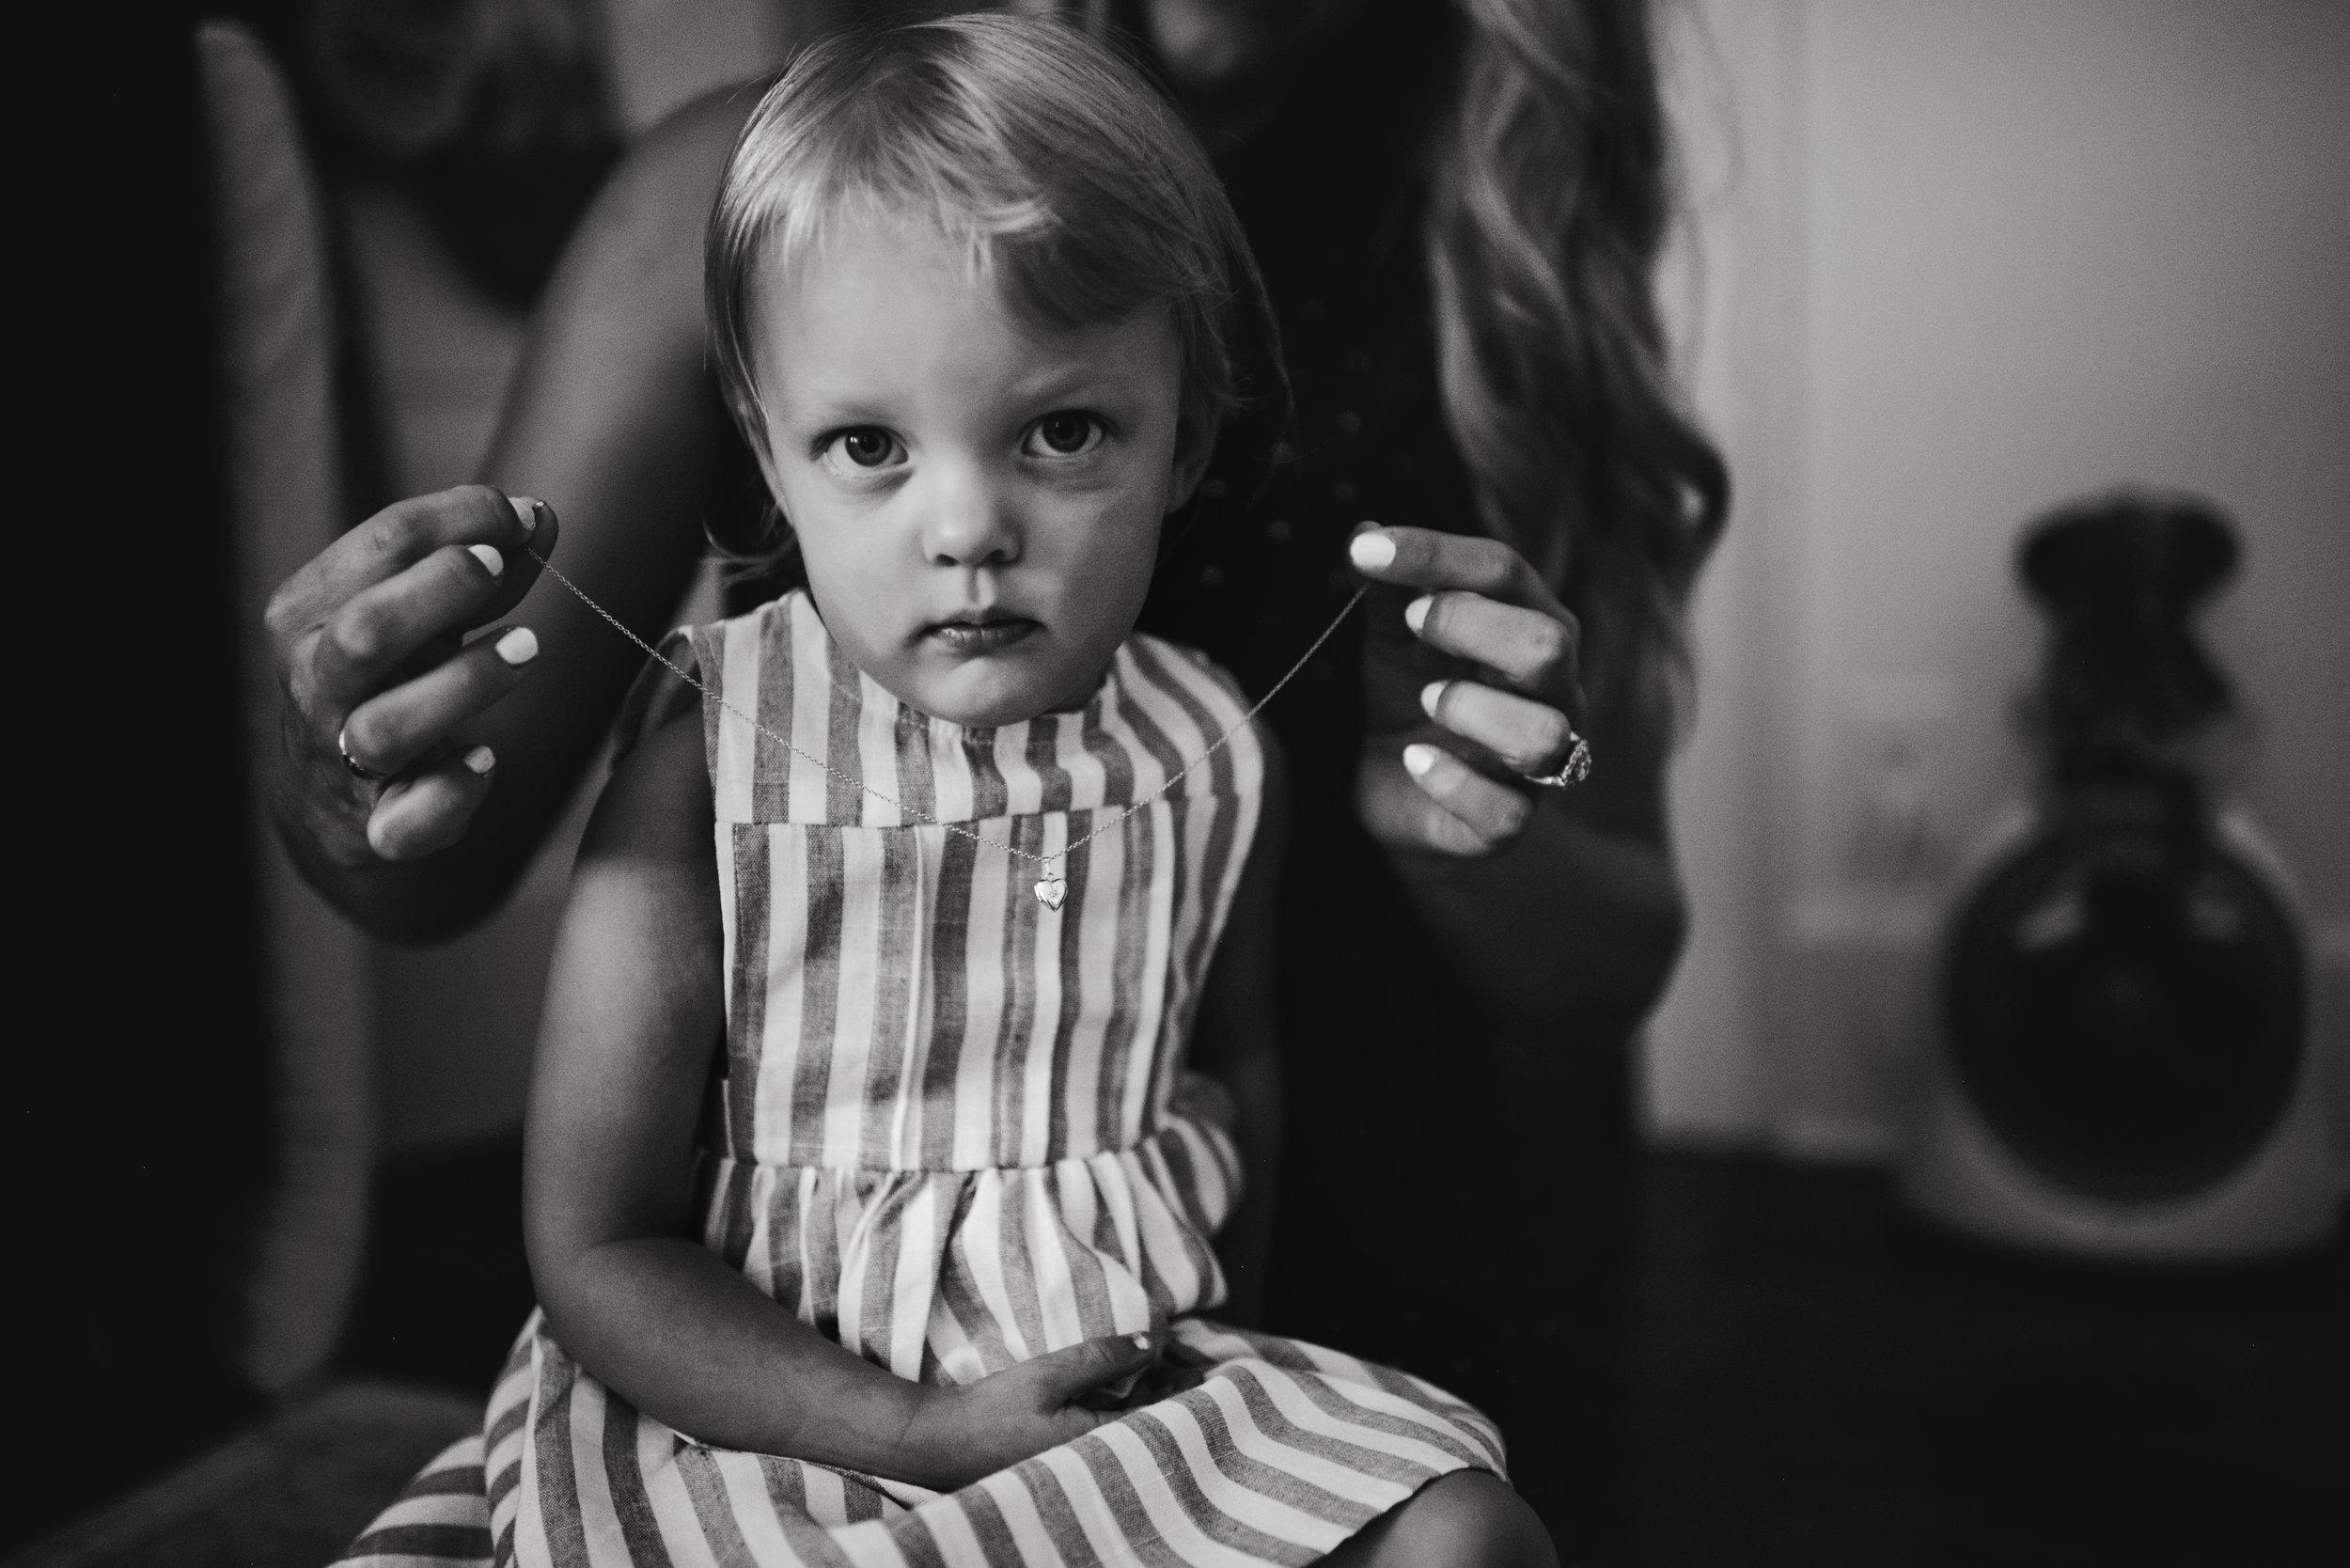 colorado-child-photographer.jpg